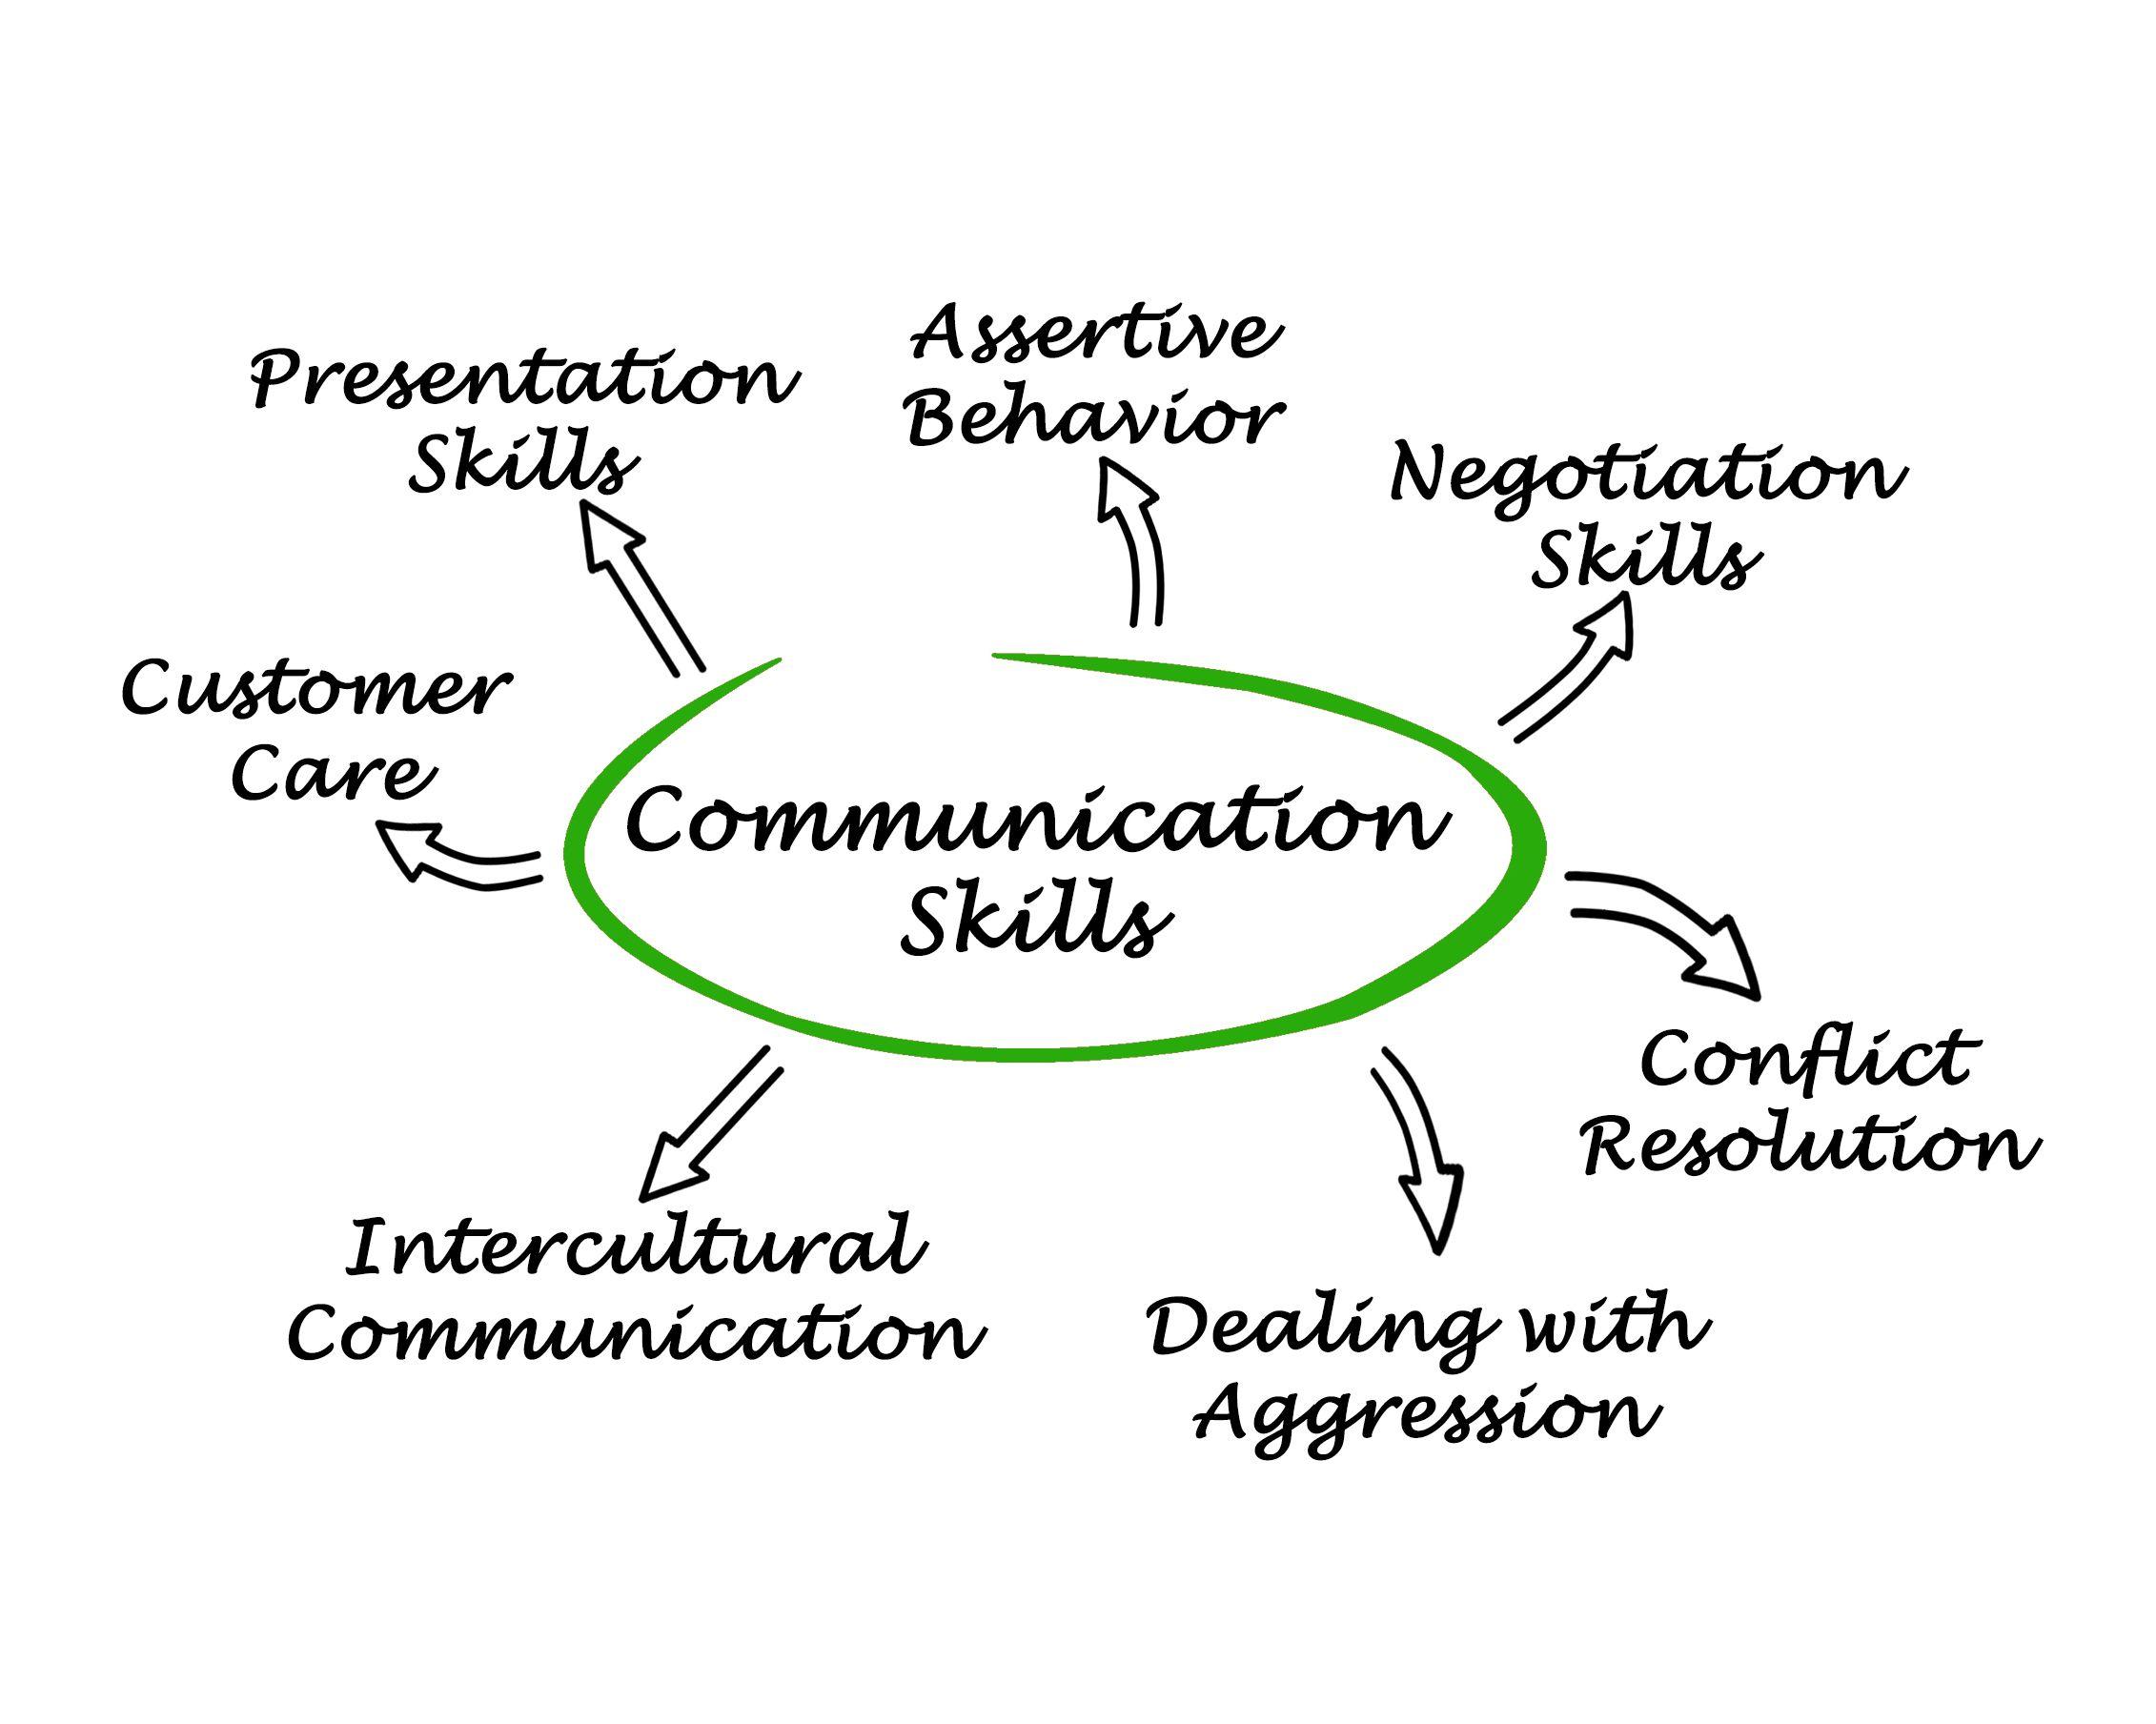 Essential Know Hows Regarding Communication Skills For Managers Effective Communication Skills Communication Skills Intercultural Communication